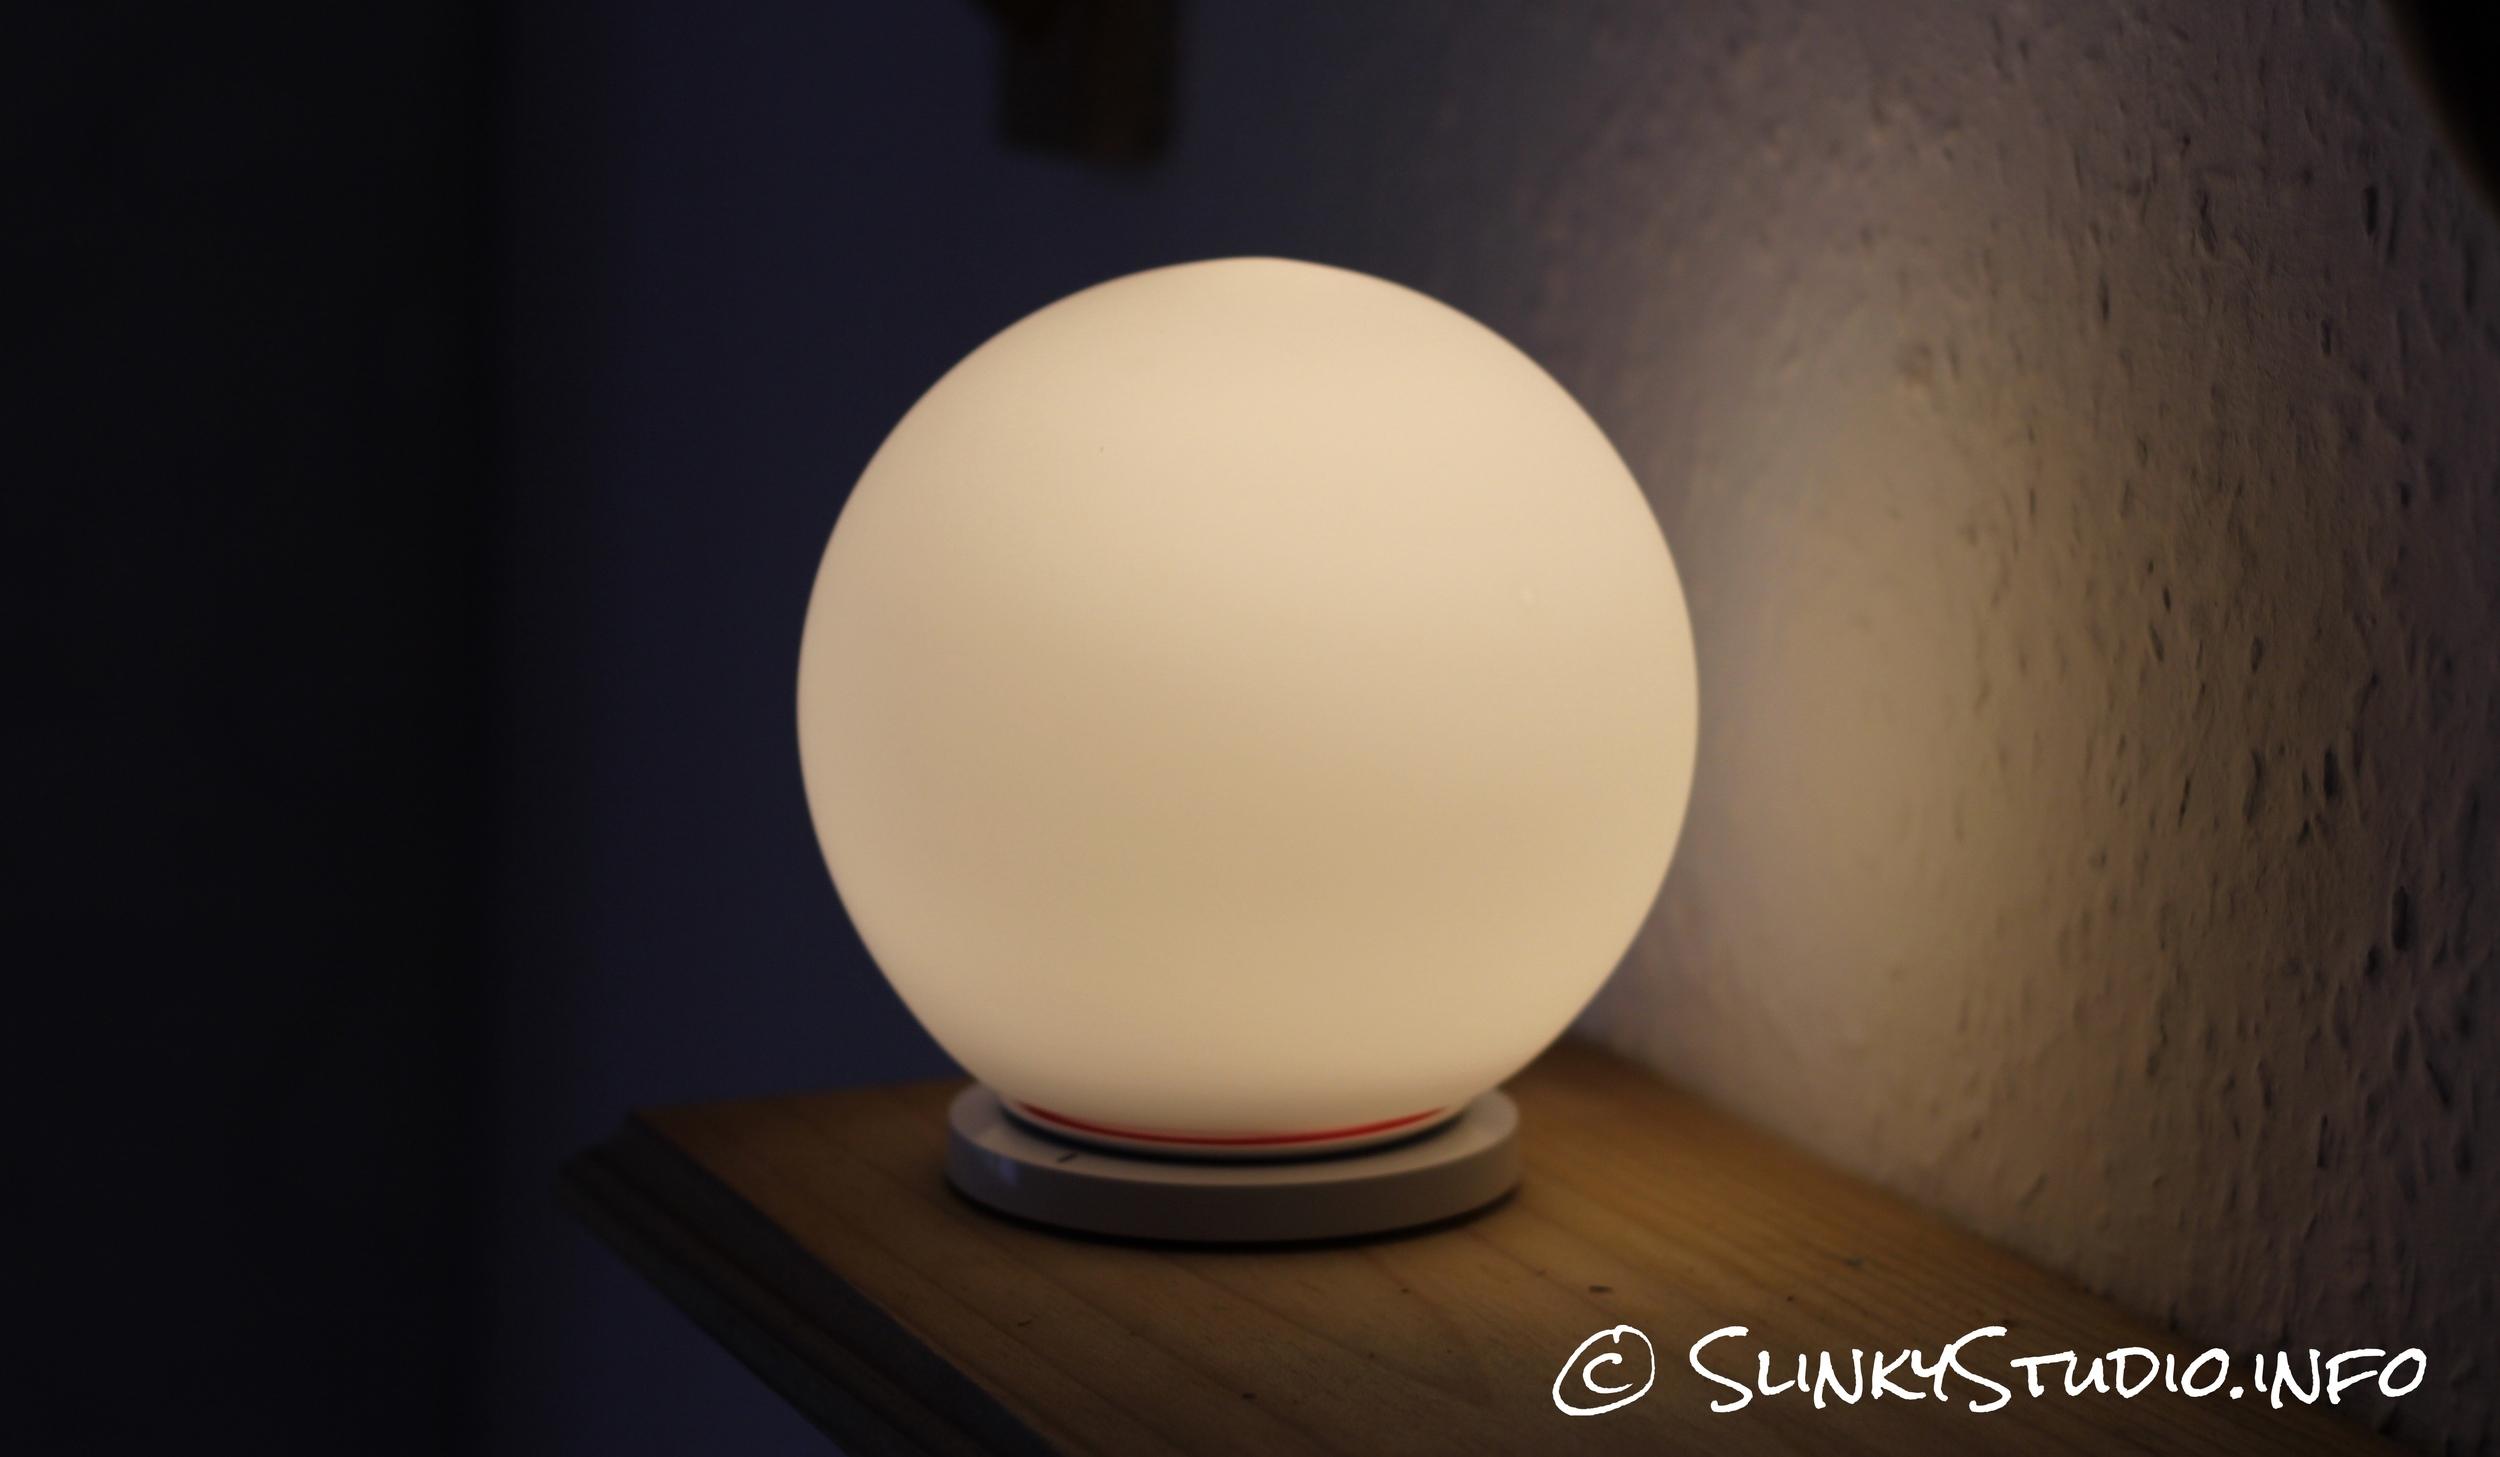 MiPow Playbulb Sphere Light On Shelf.jpg